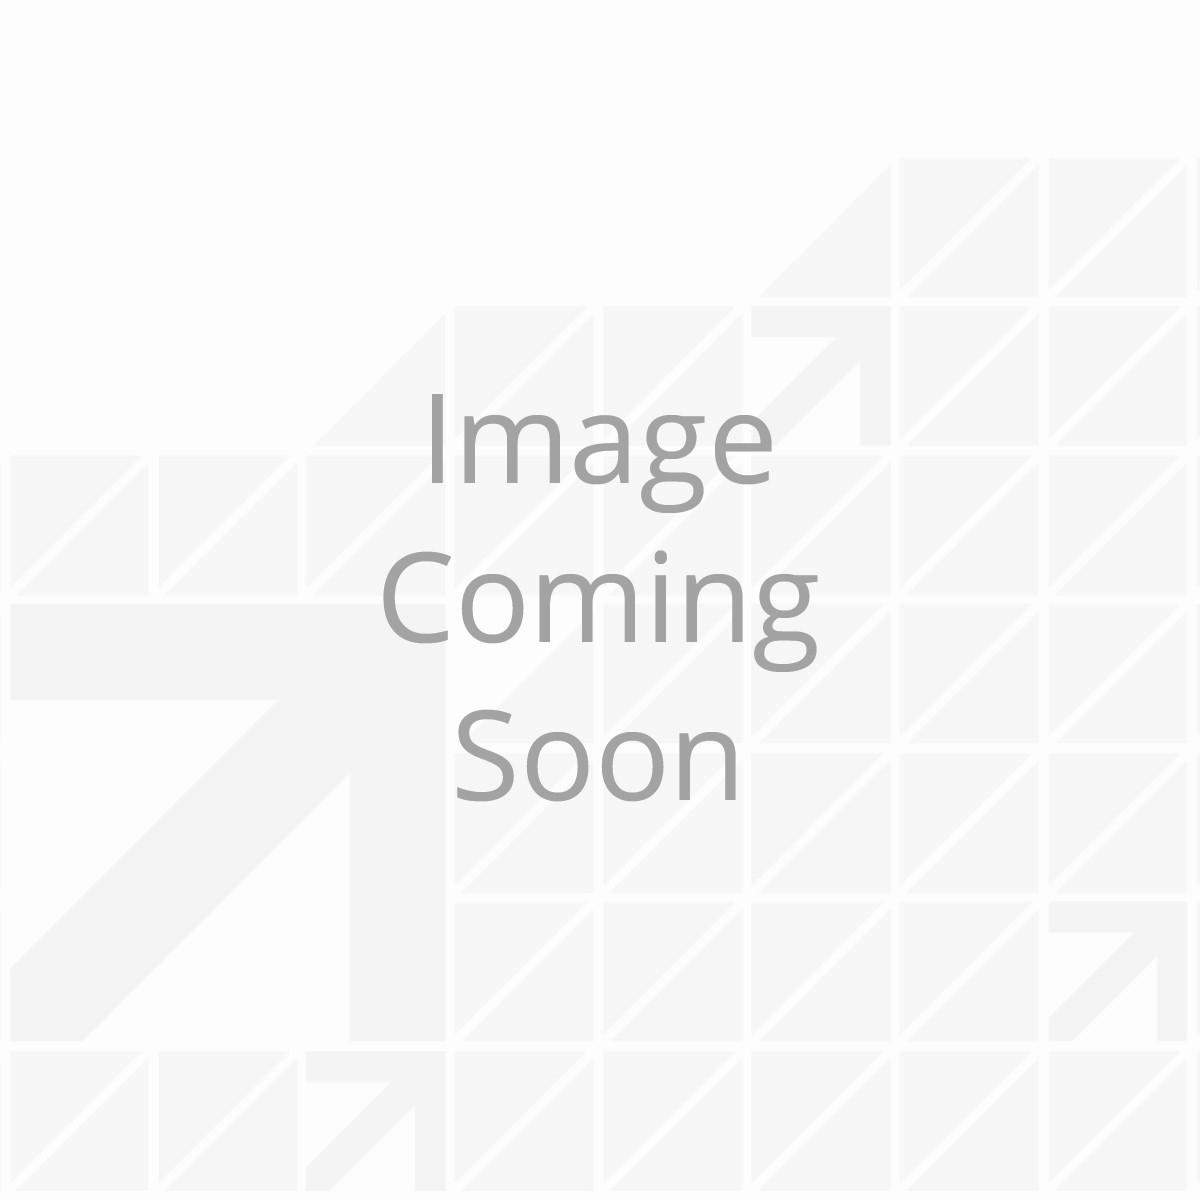 21' Destination Awning Roller Assembly - Solid Black (Black Shield)